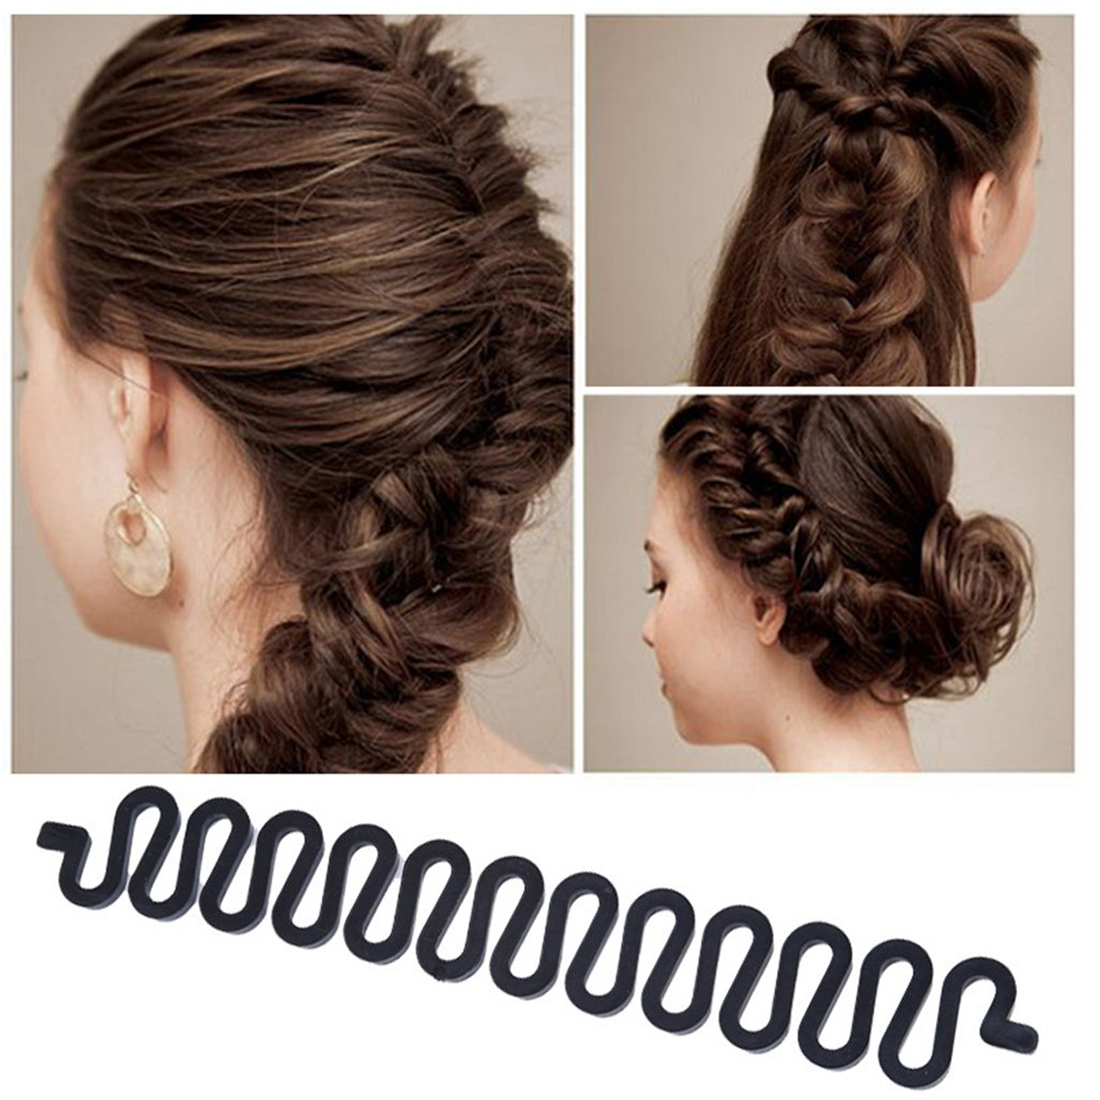 Black Fashion Magic Barber Accessories Braided Artifact Lazy Hair Tools Hairpin Accessories Salon Accessories